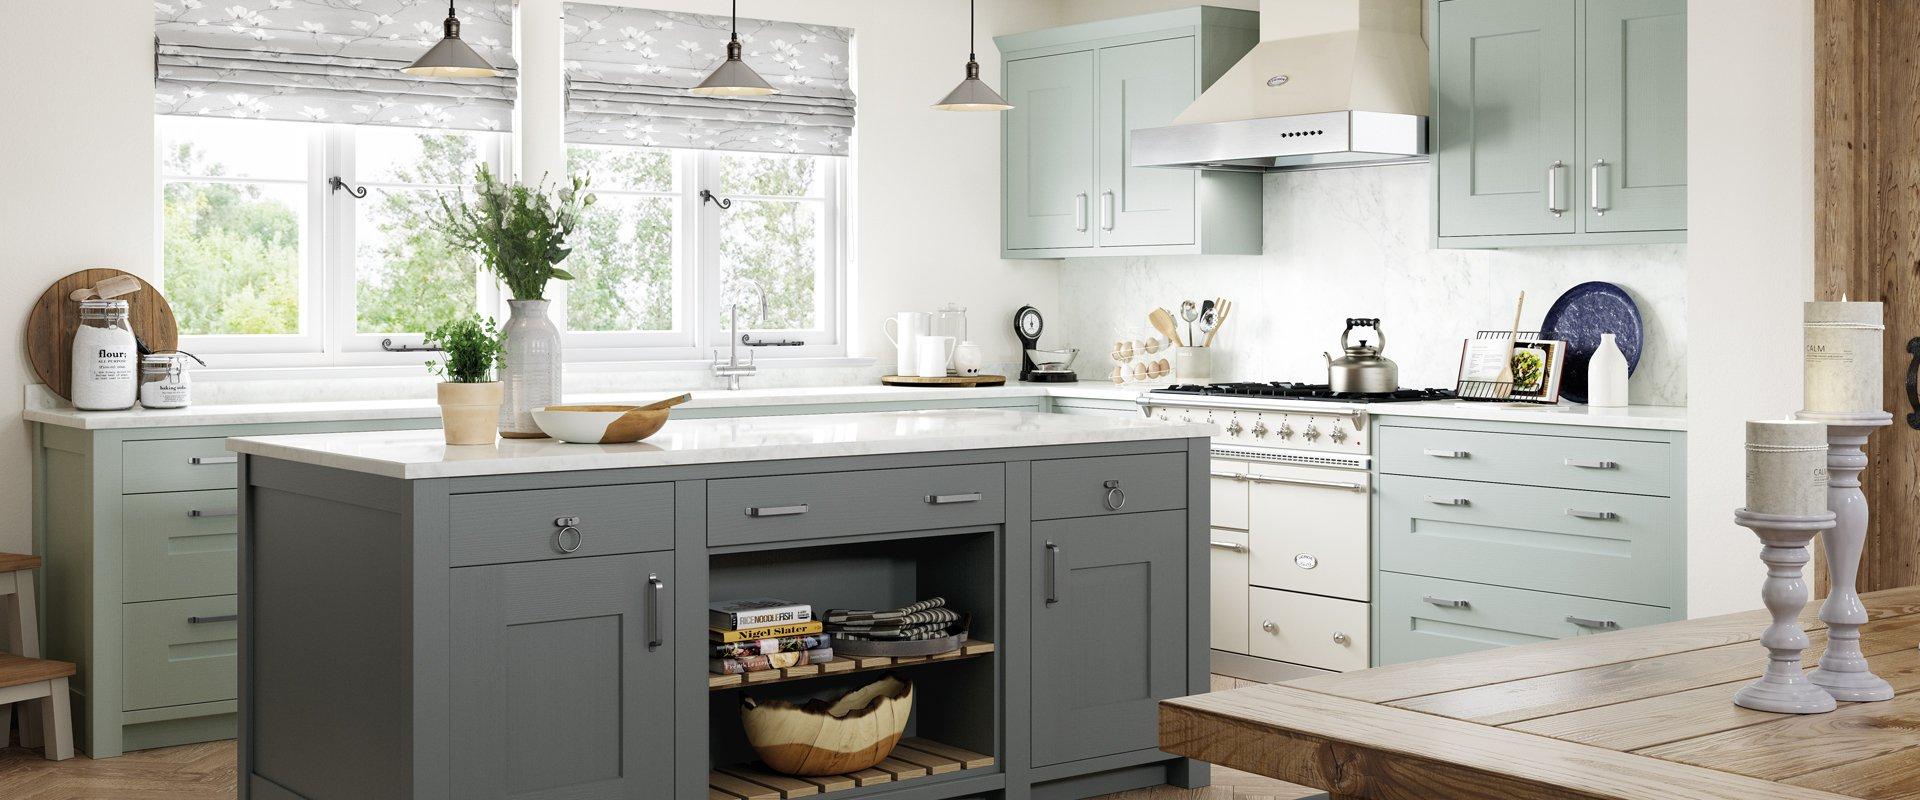 Timeless Elegance - Kitchen Design hertfordshire